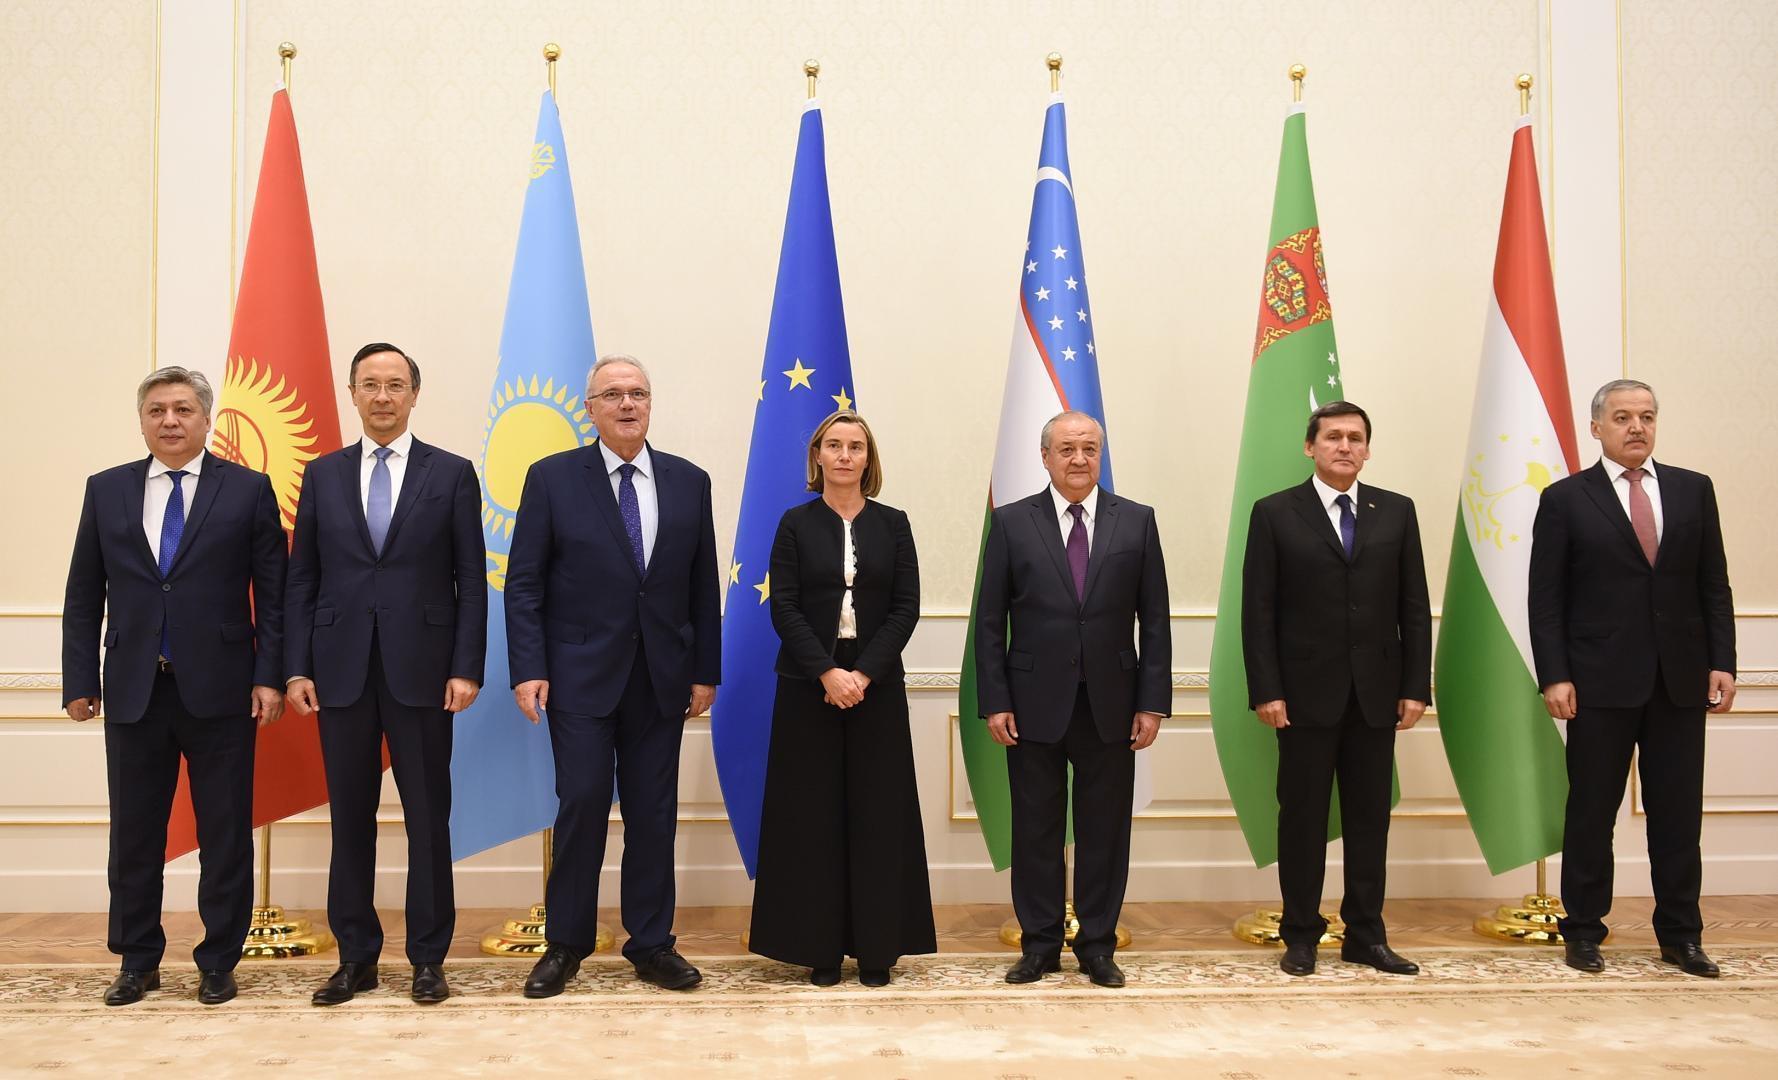 Asia Centrala, regiune importanta pentru diplomatia UE